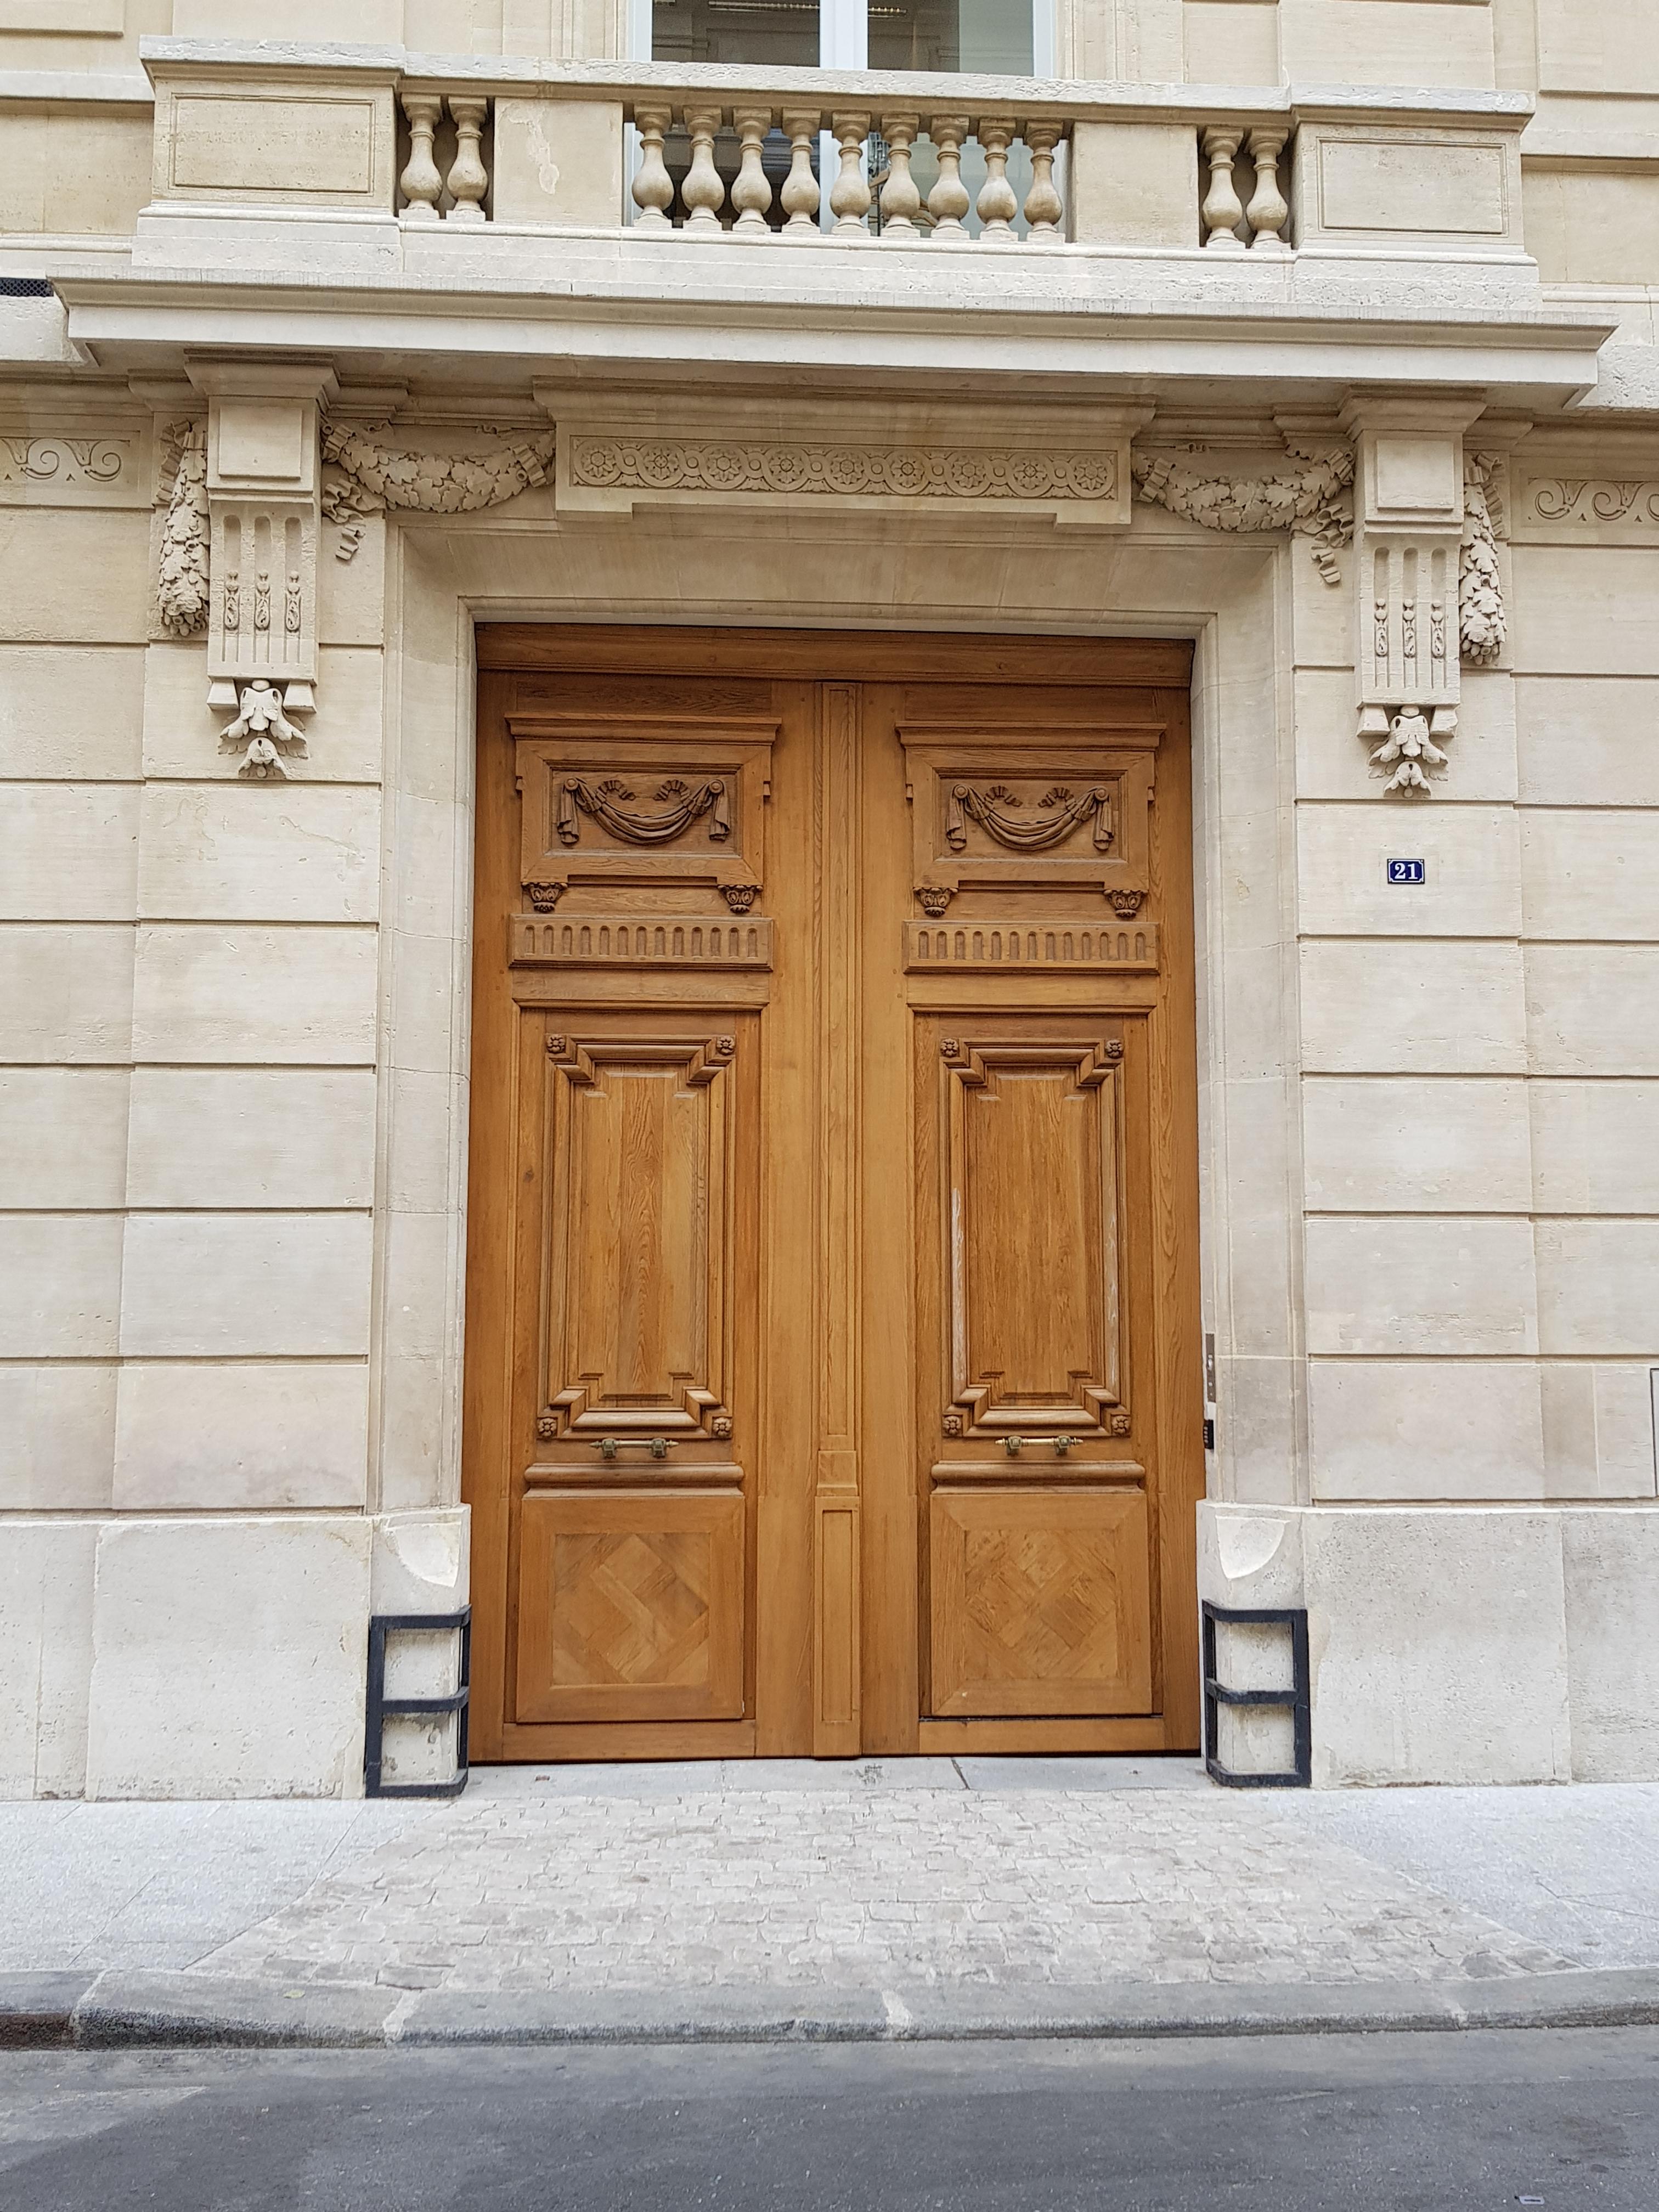 Tete De Lit Porte De Grange porte (architecture) — wikipédia